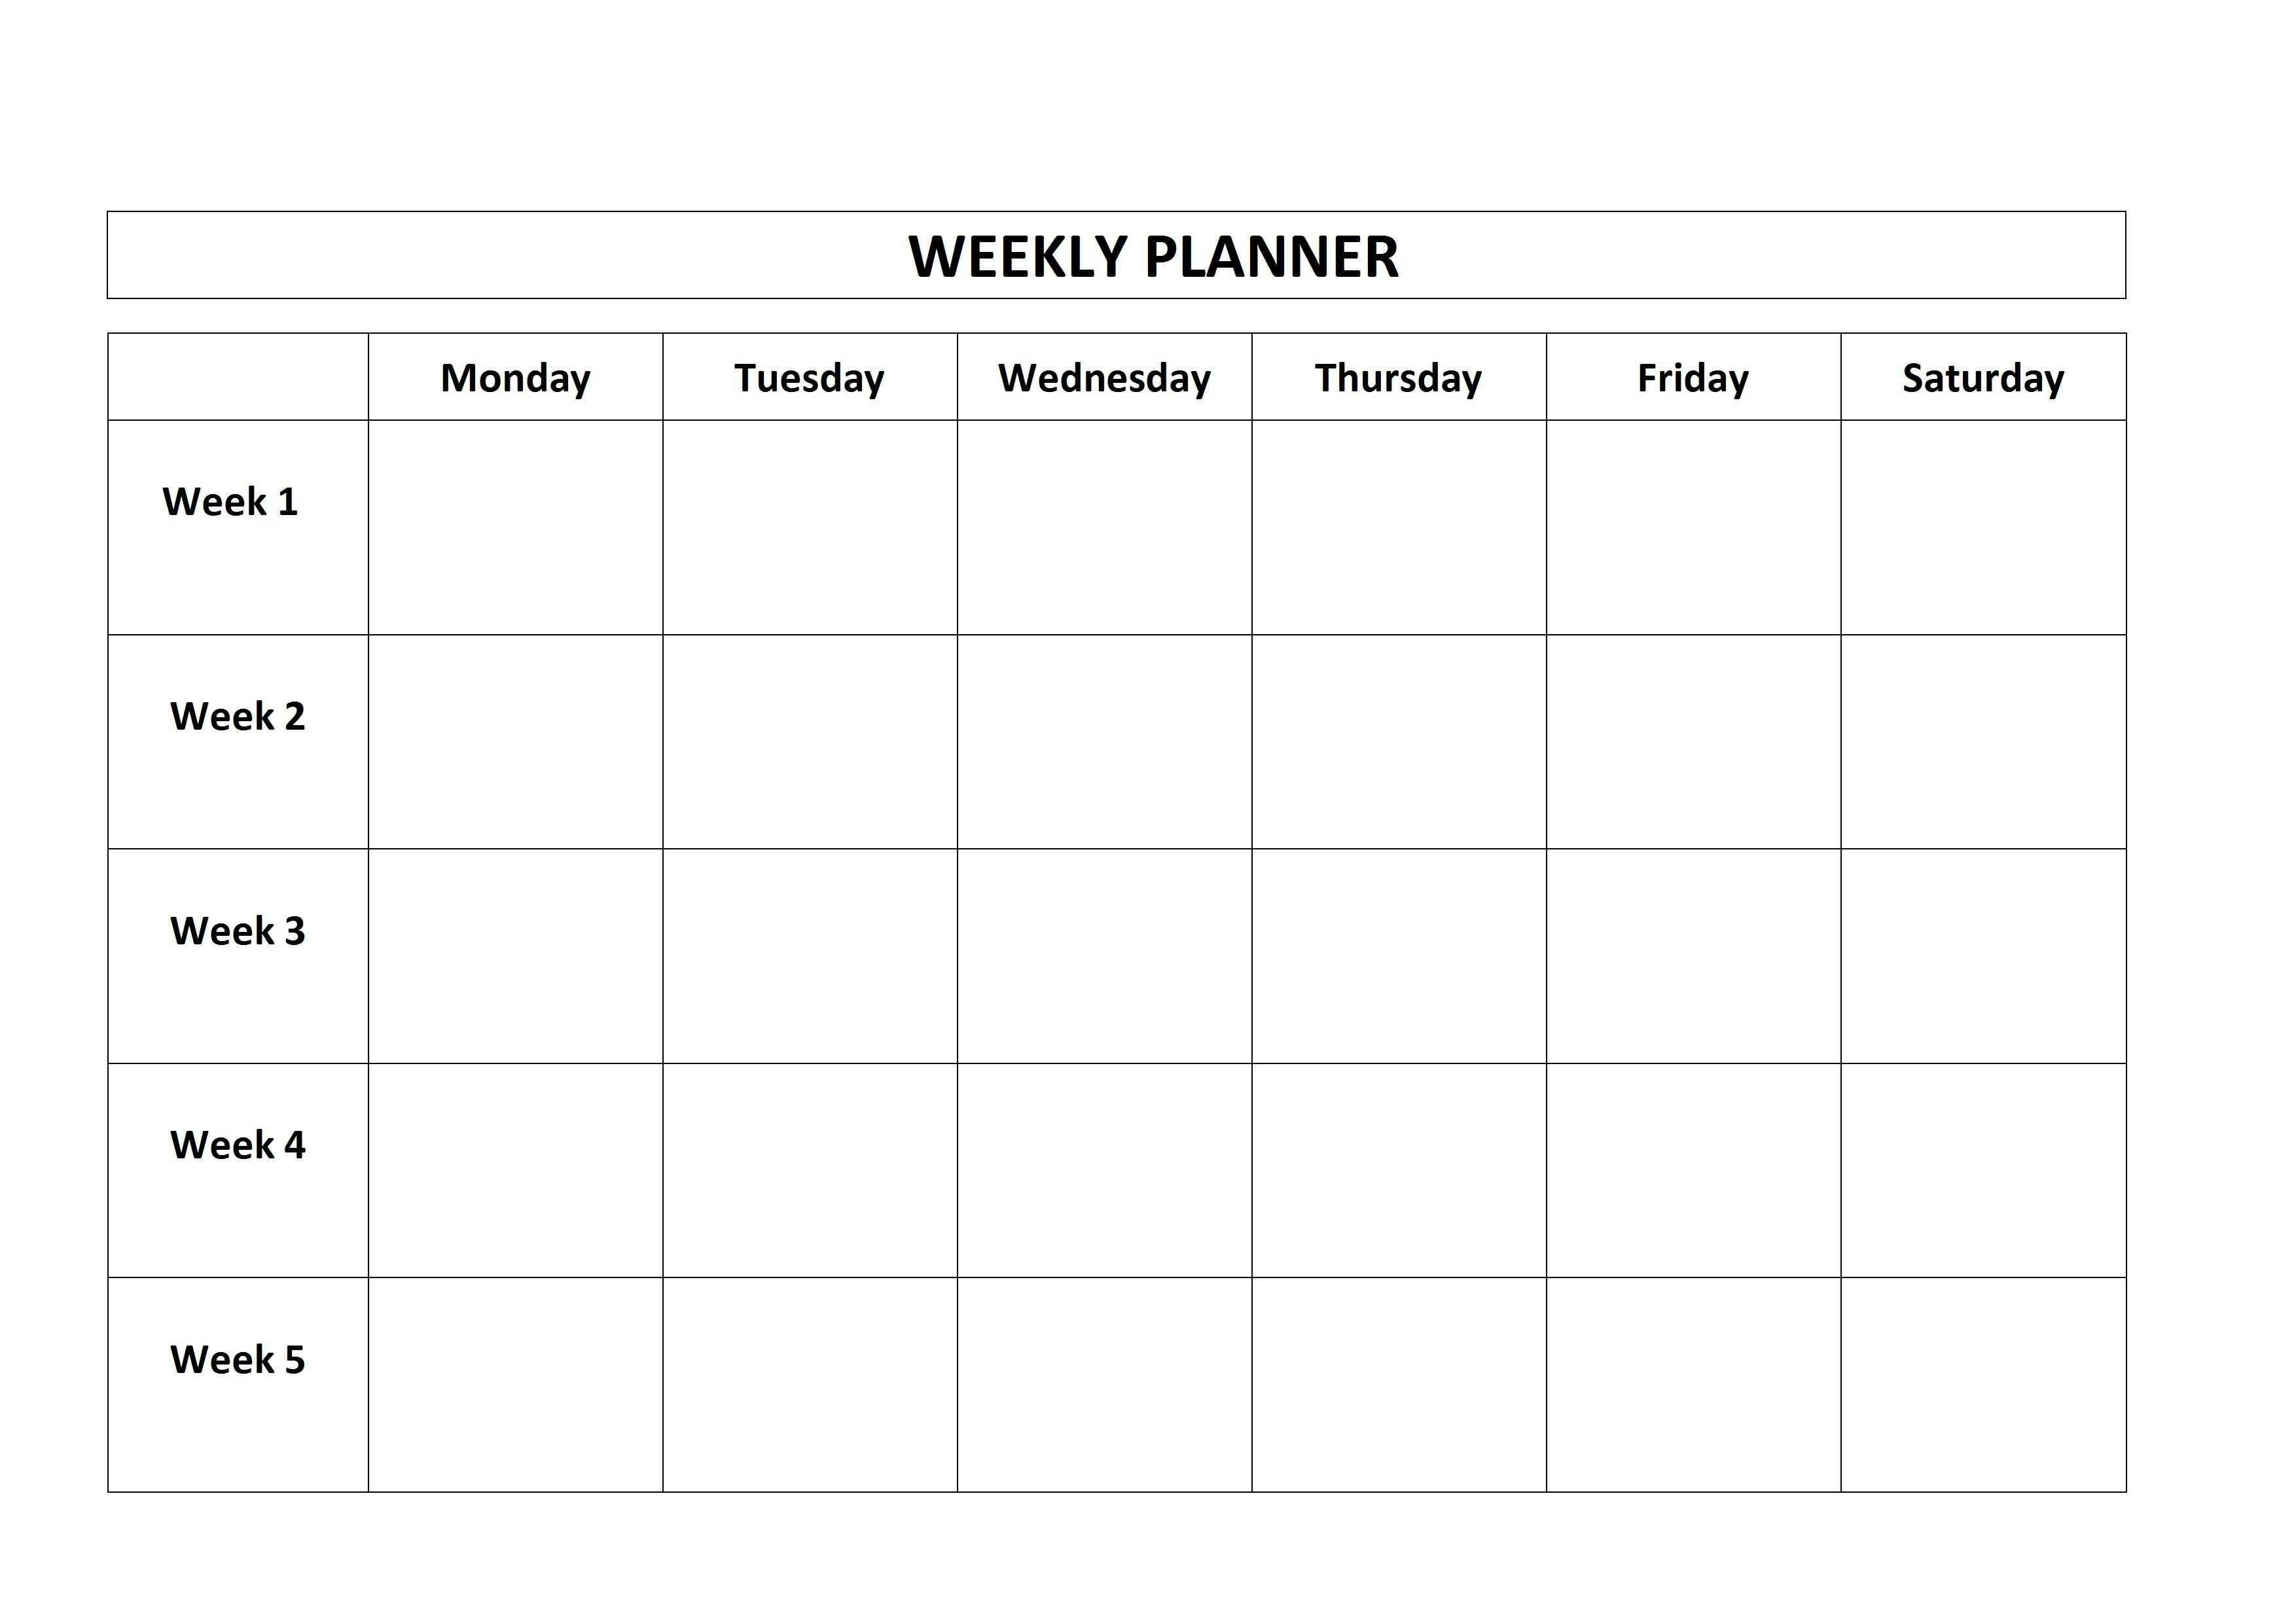 5 Day Calendar Template - Vaydile.euforic.co-Blank Calendar Template within 5 Day Calendar Template